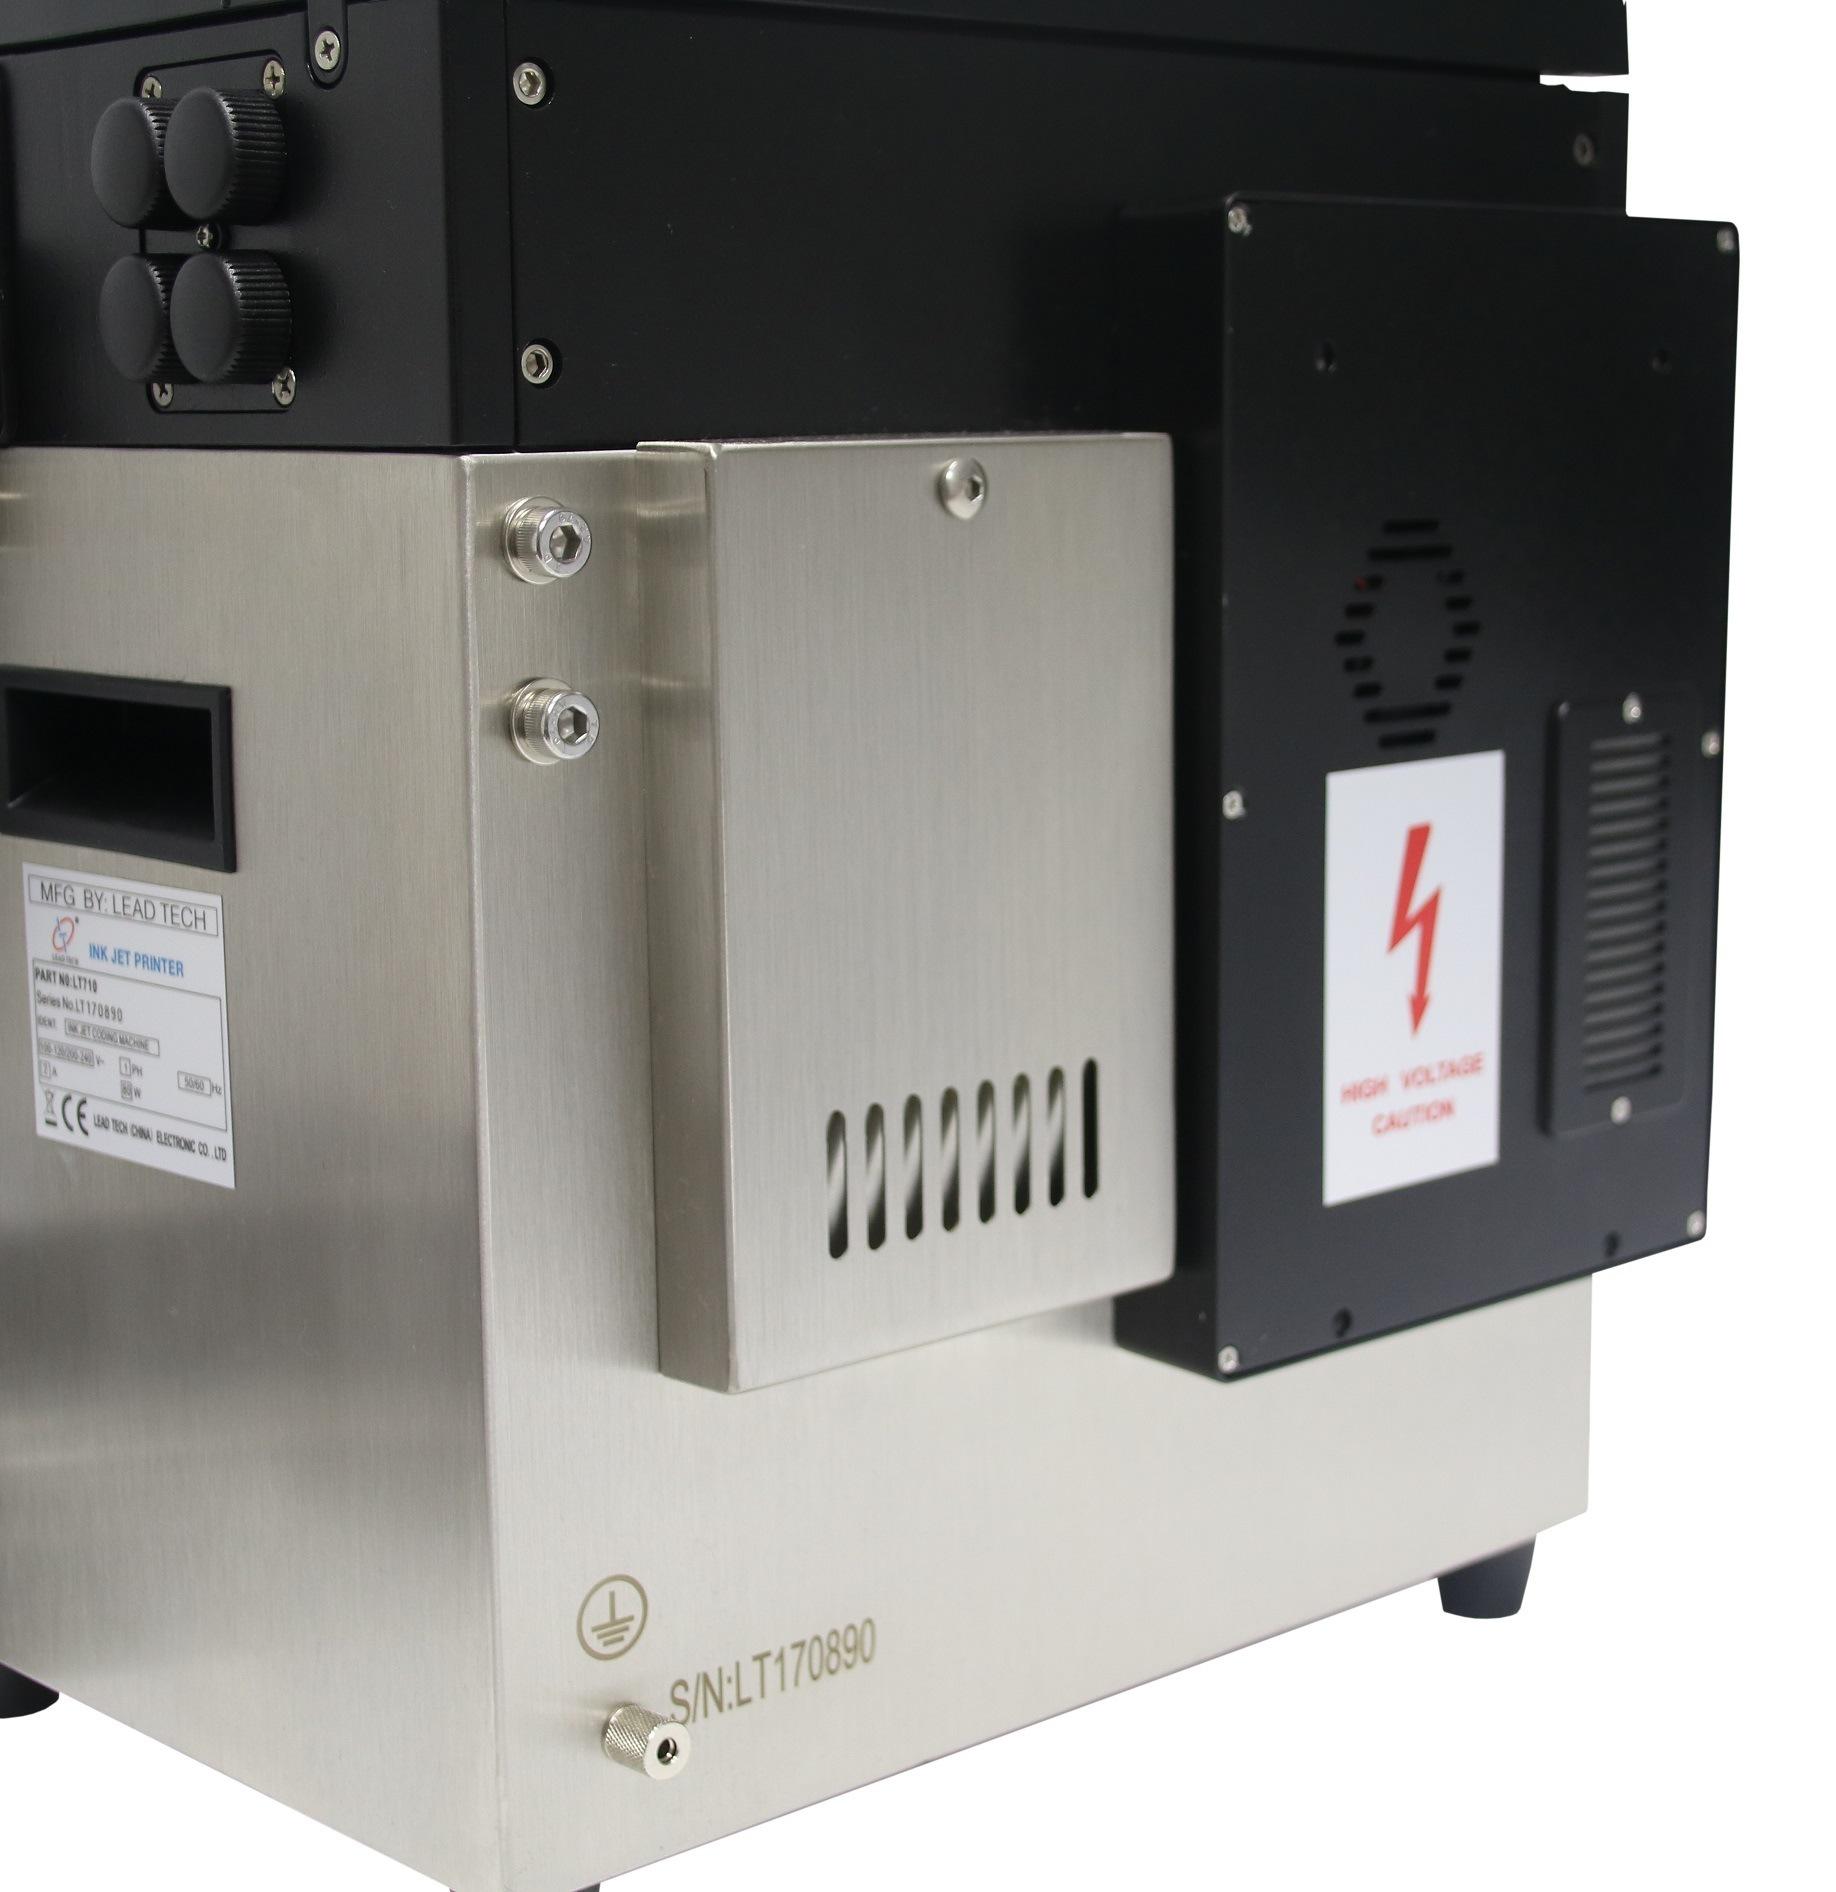 Lead Tech Lt760 Continuous PE Pipe Coding Inkjet Printer